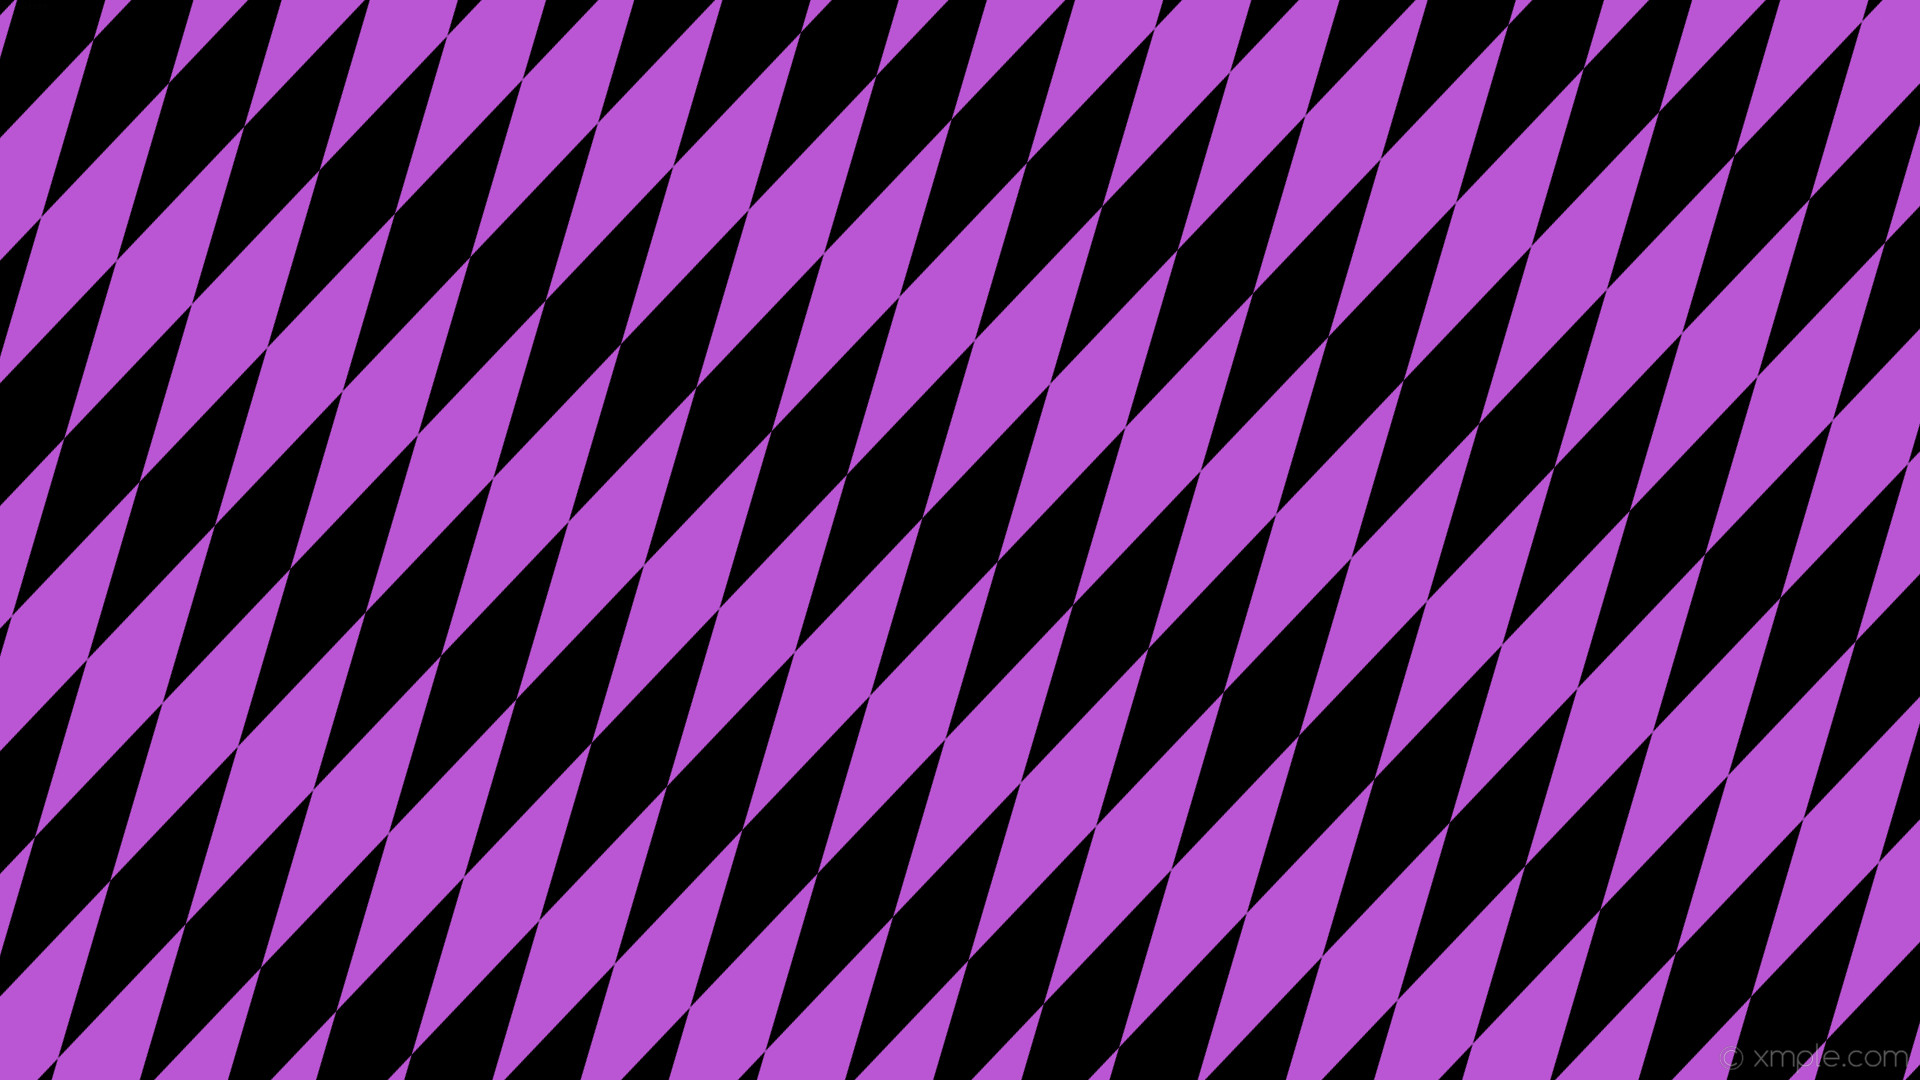 wallpaper rhombus black purple diamond lozenge medium orchid #000000  #ba55d3 60° 360px 87px